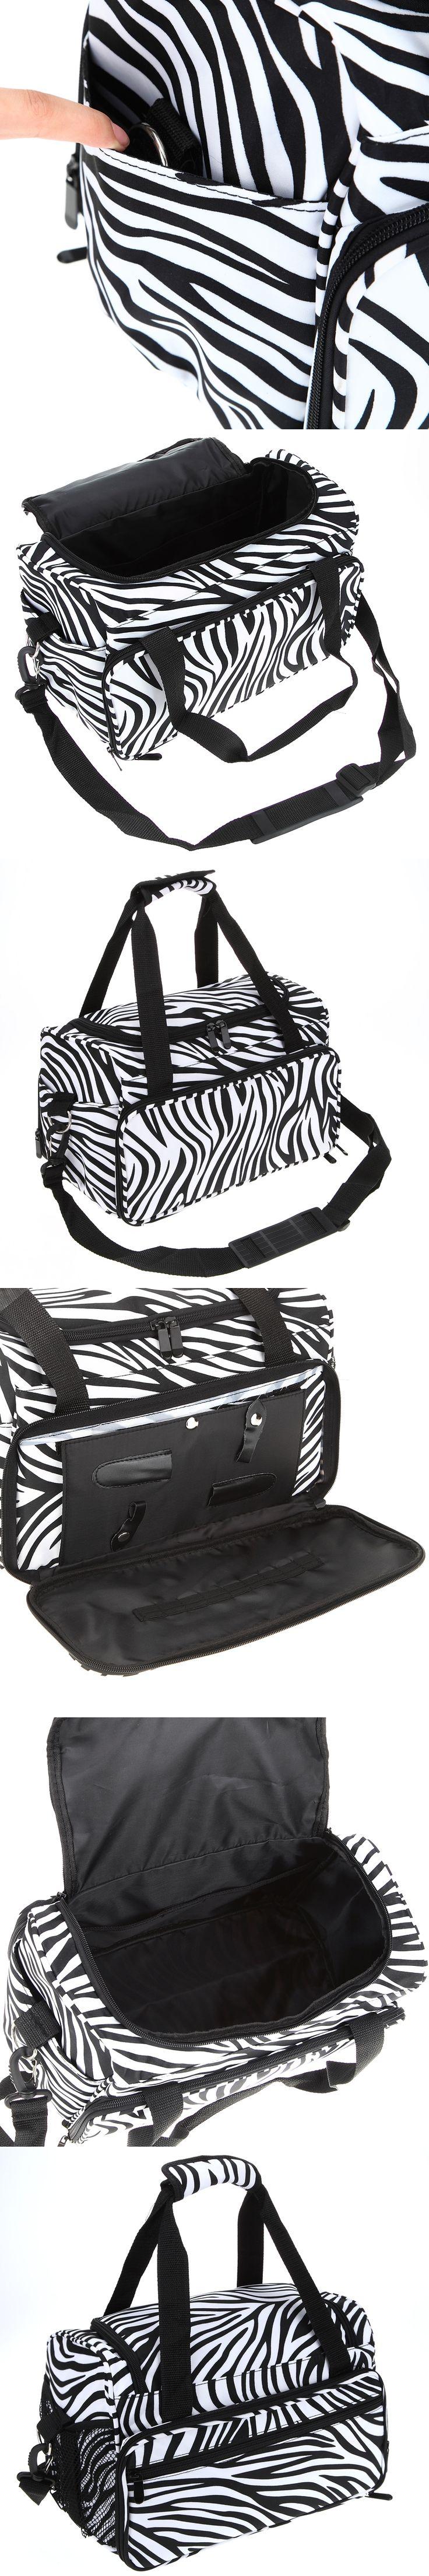 Pro Hairdressing Tools Bag Canvas Zebra Design Handbag Stored Scissors Clips Salon Barber Portable Storage Toolkits